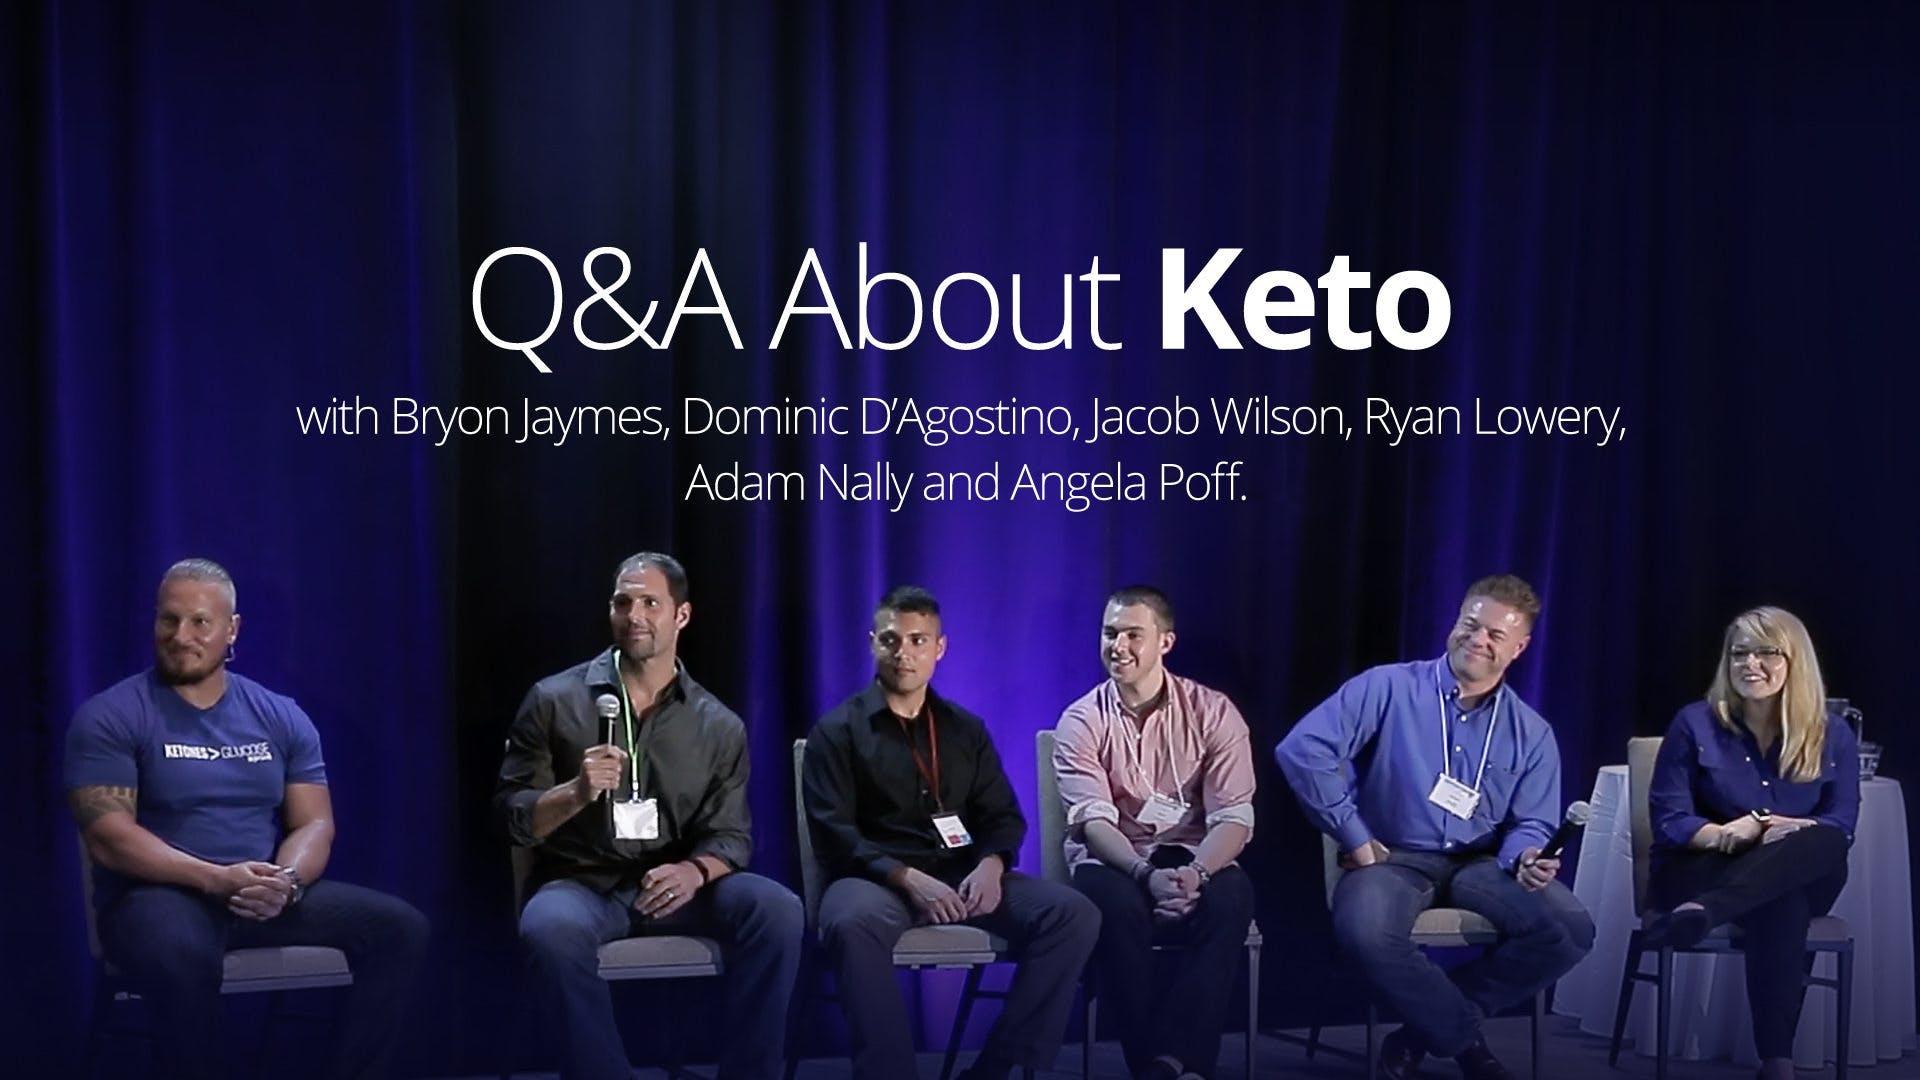 Q&A about keto